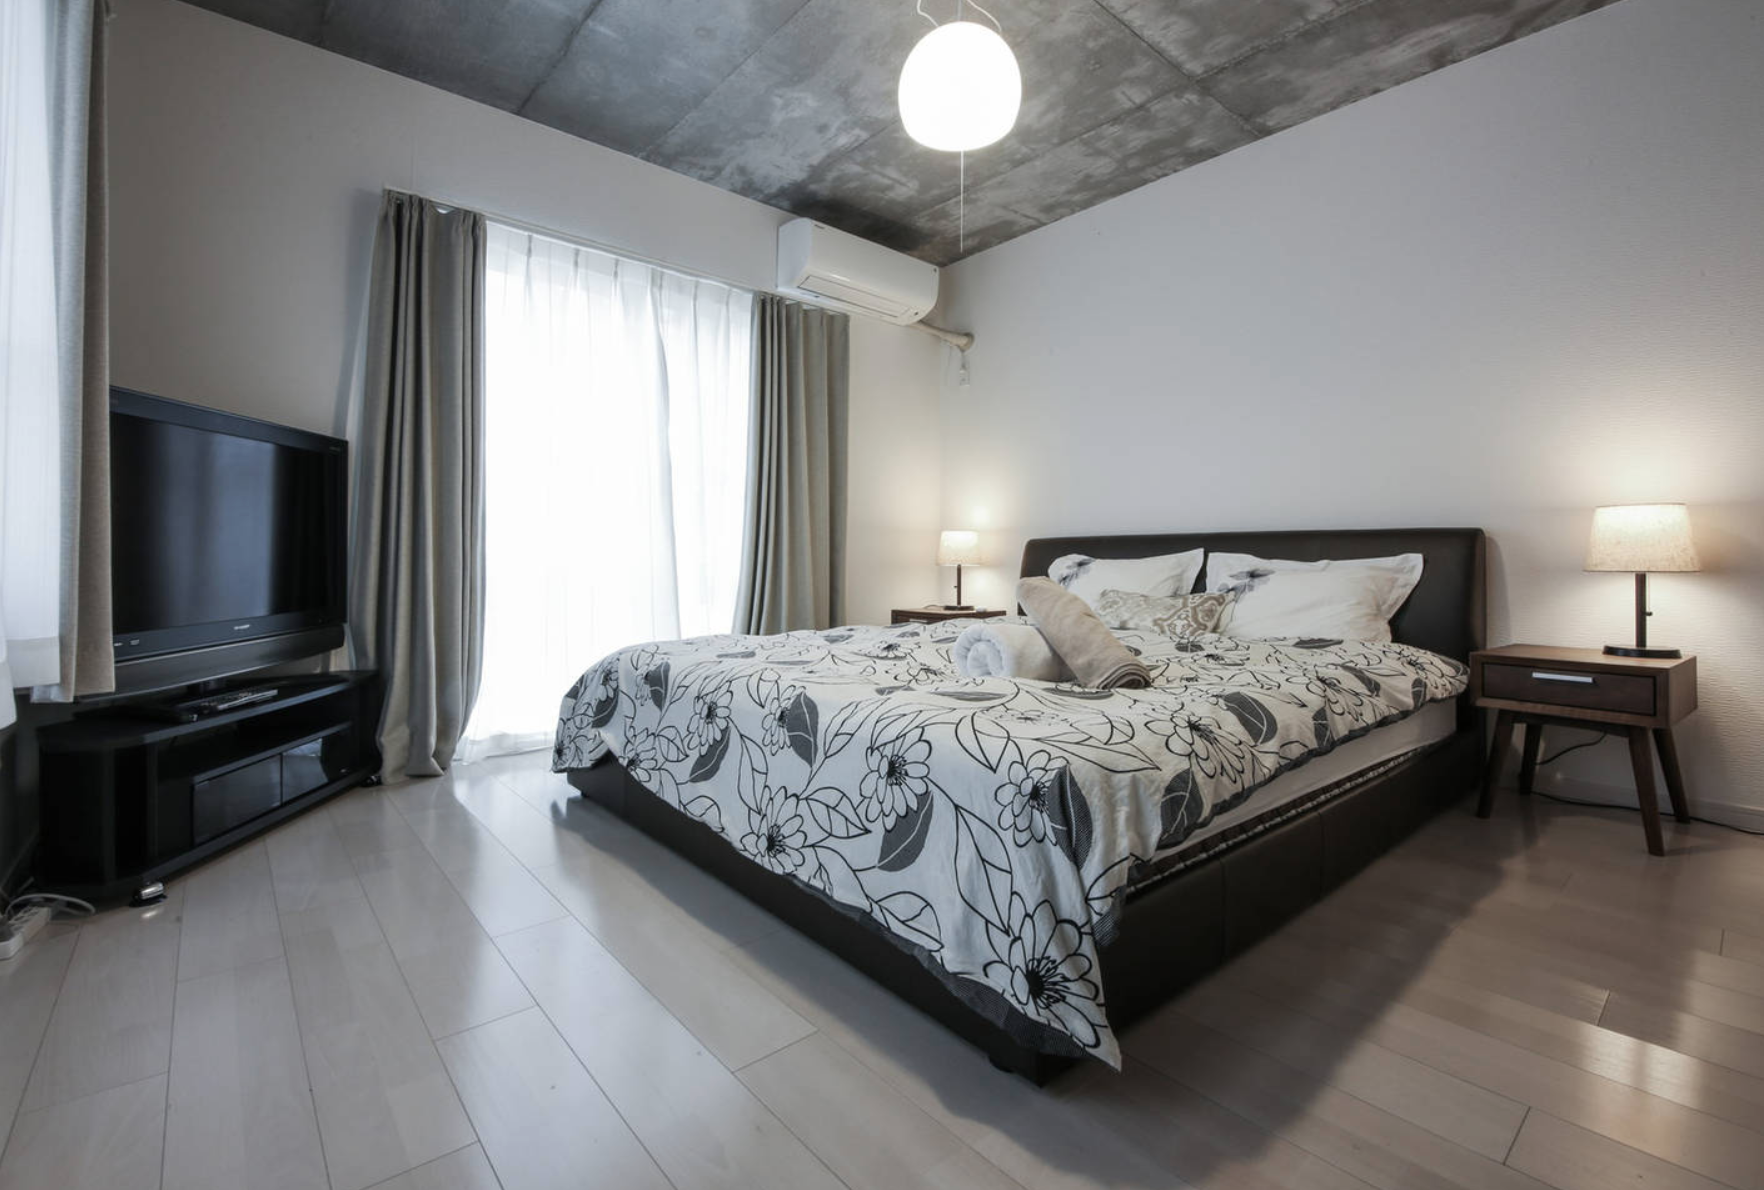 2BR furnished apartment in Minami-Azabu Regalia #401